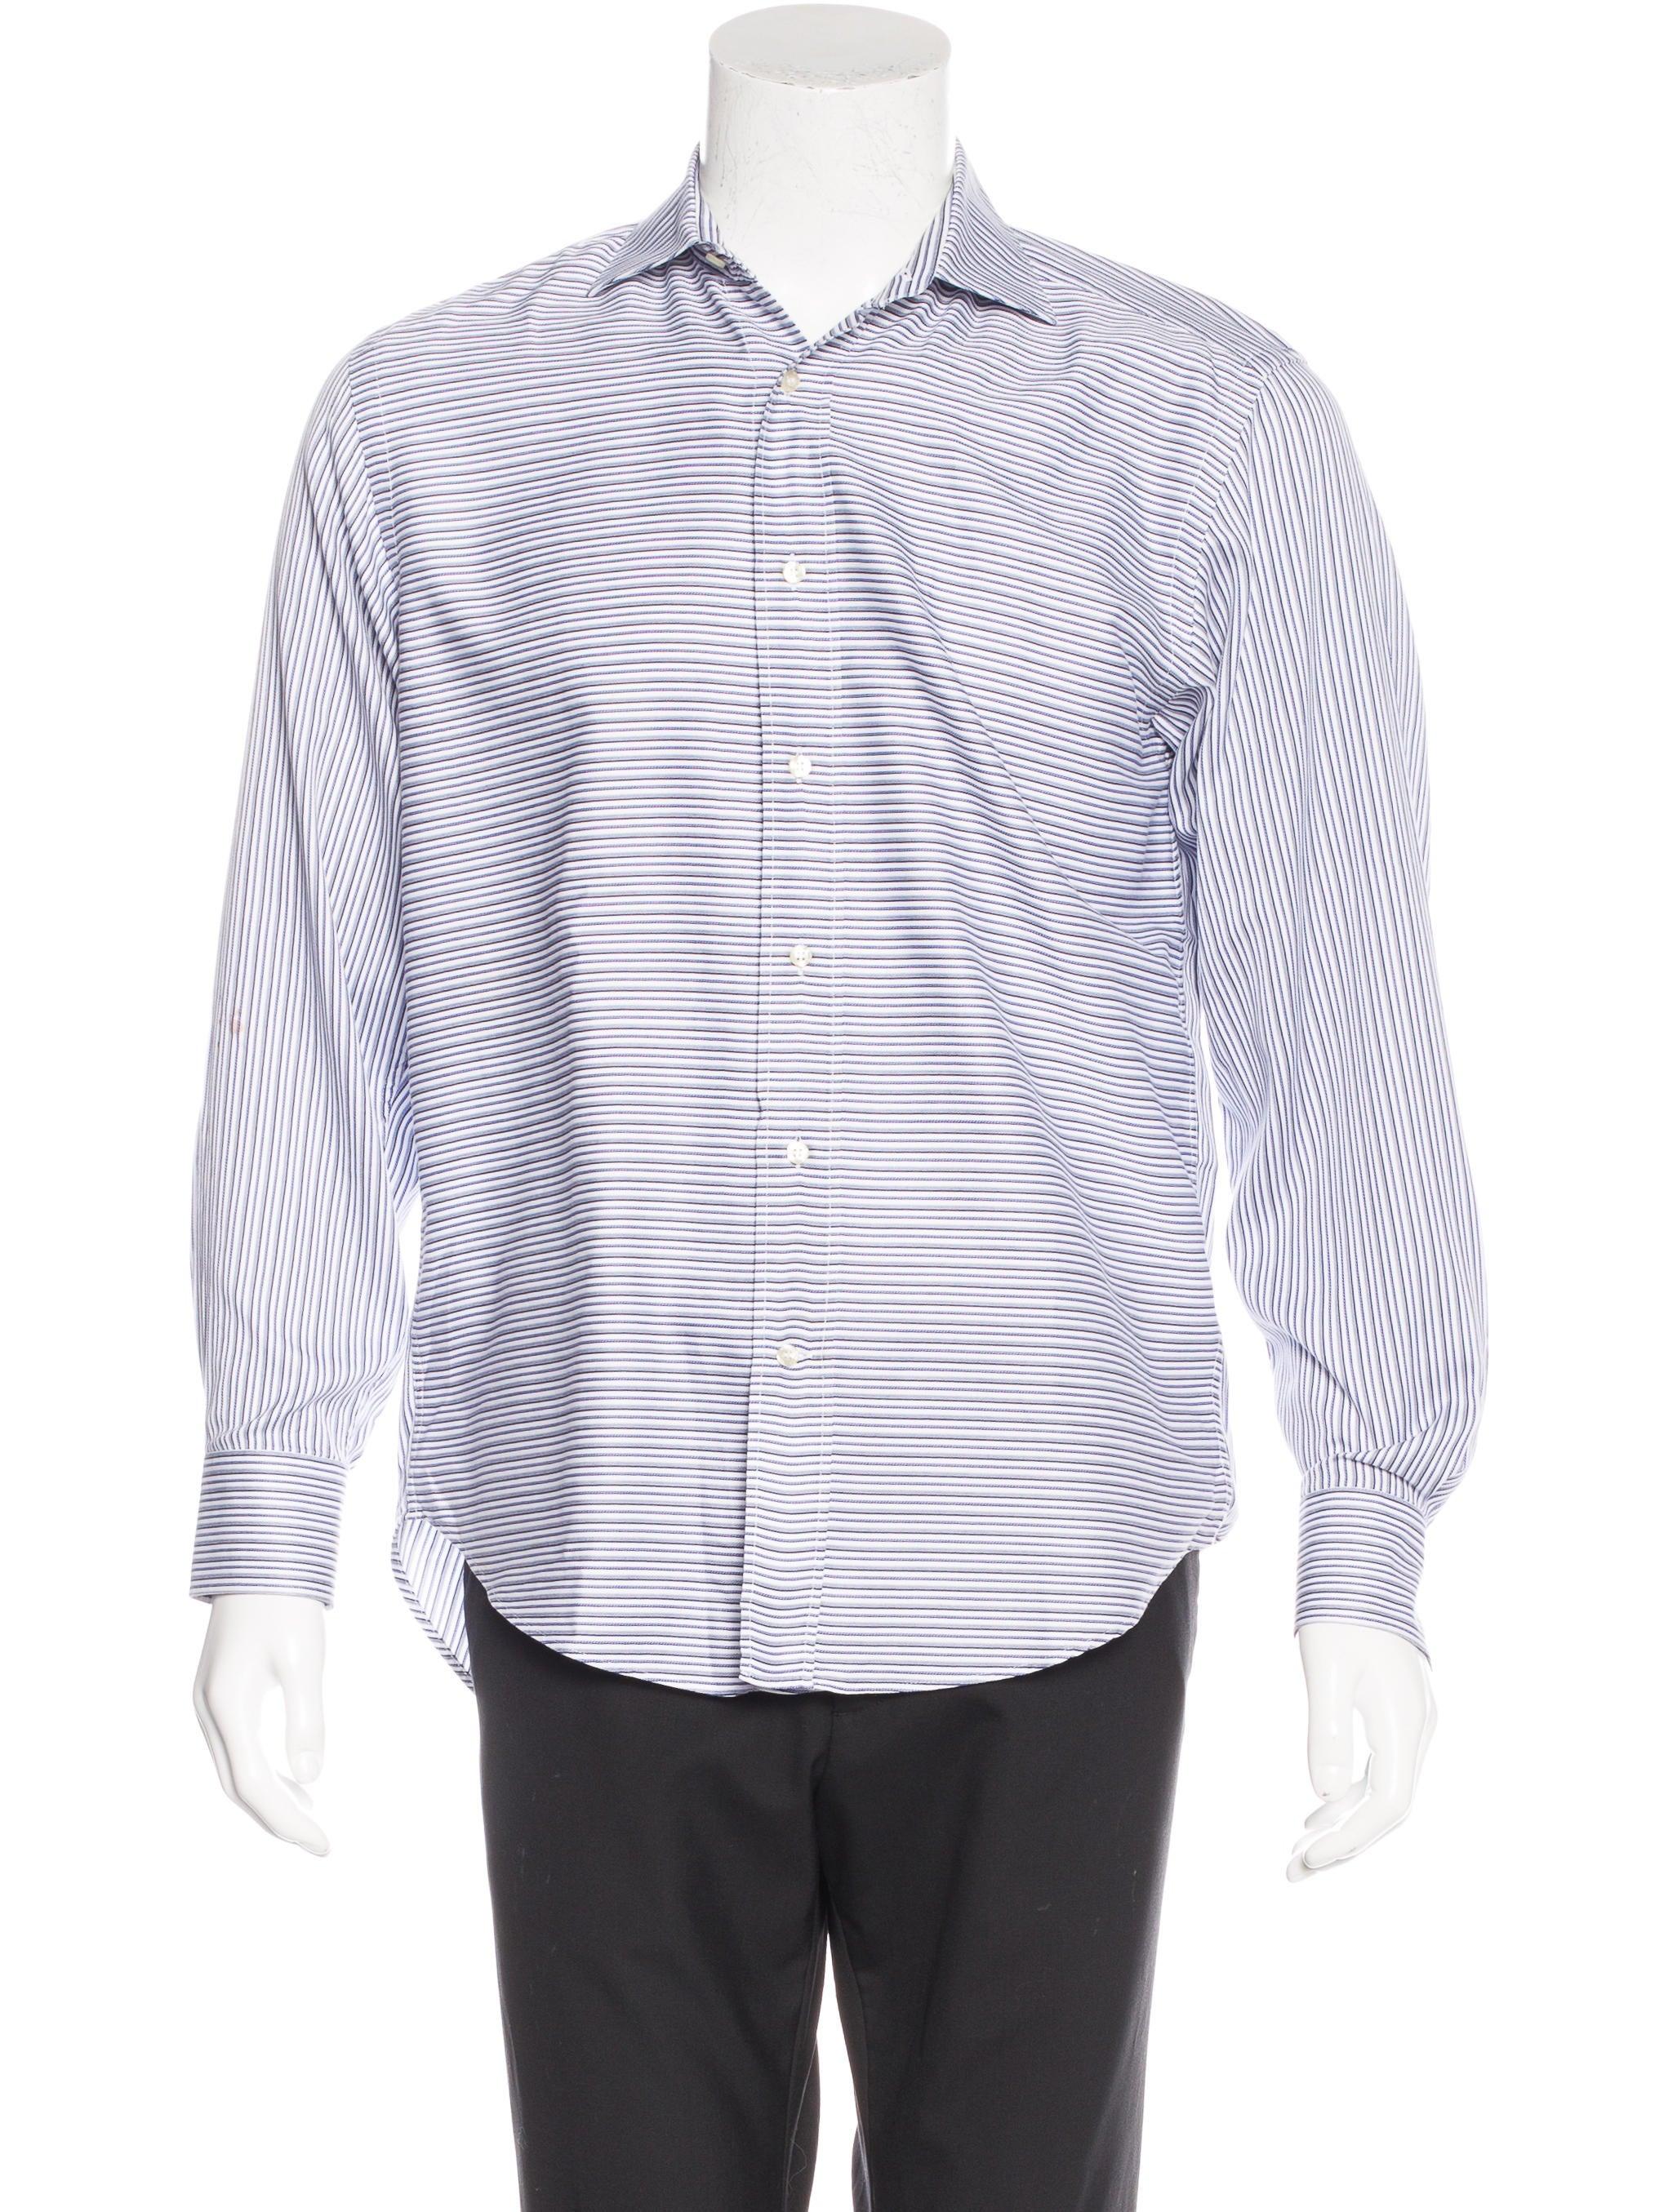 Etro striped dress shirt mens shirts etr44118 the for Etro men s shirts